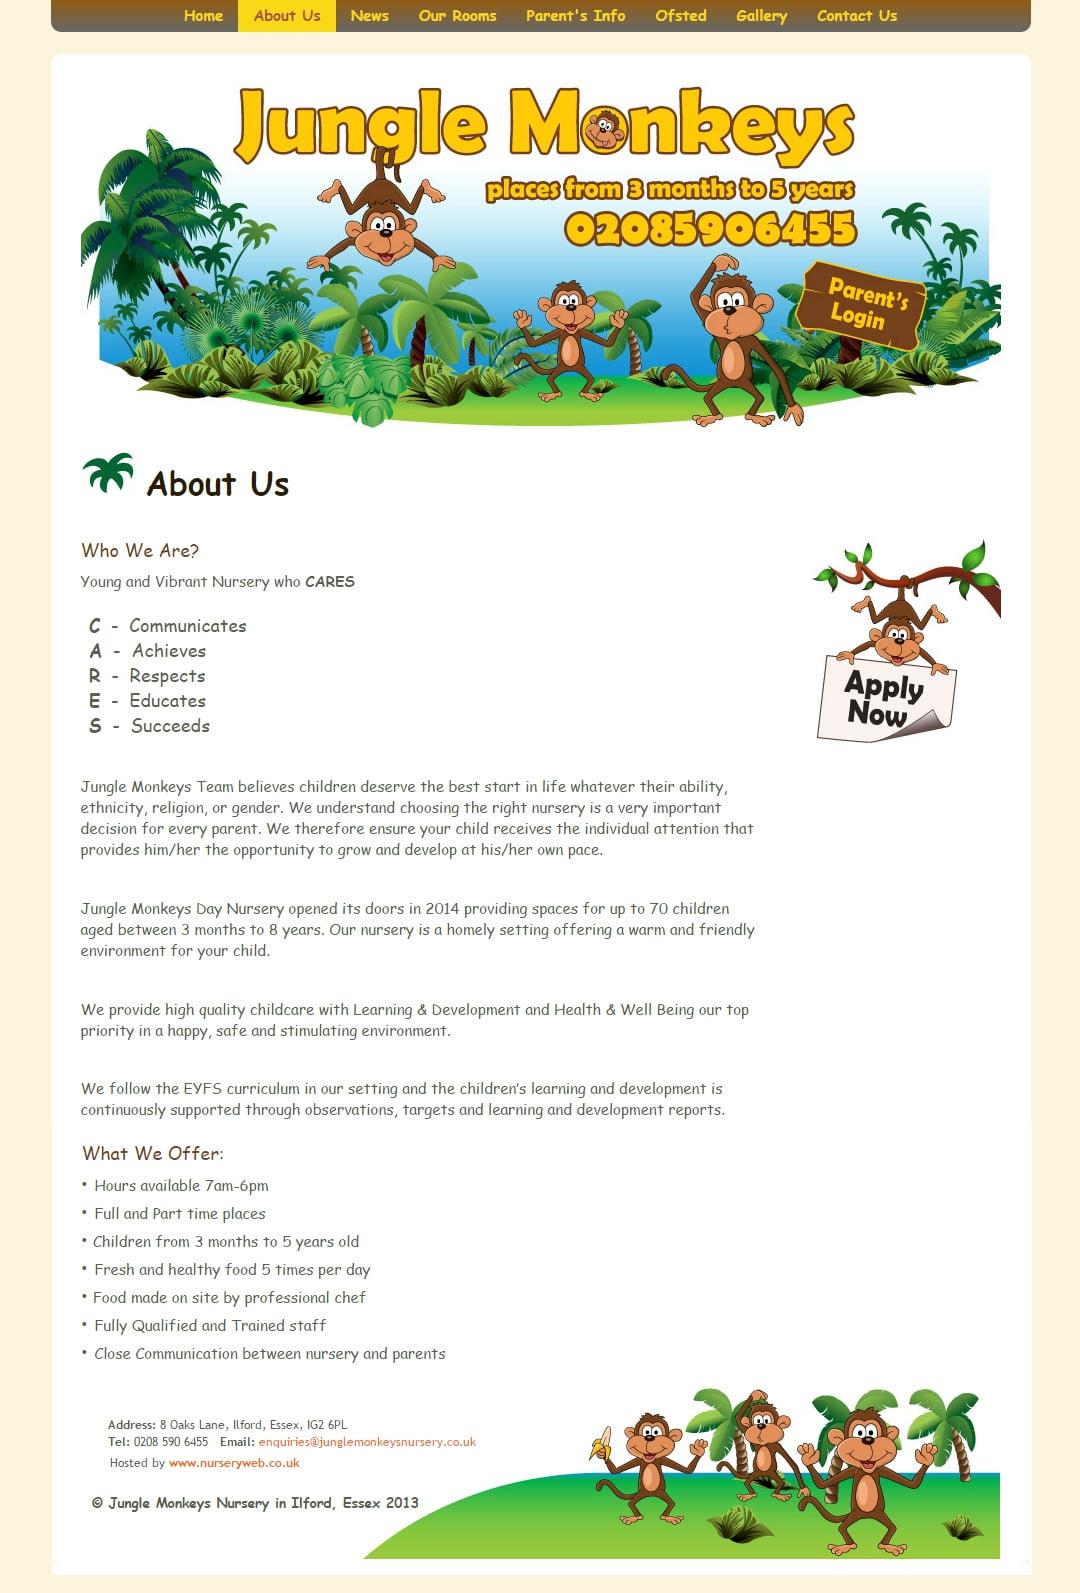 Jungle Monkeys Nursery